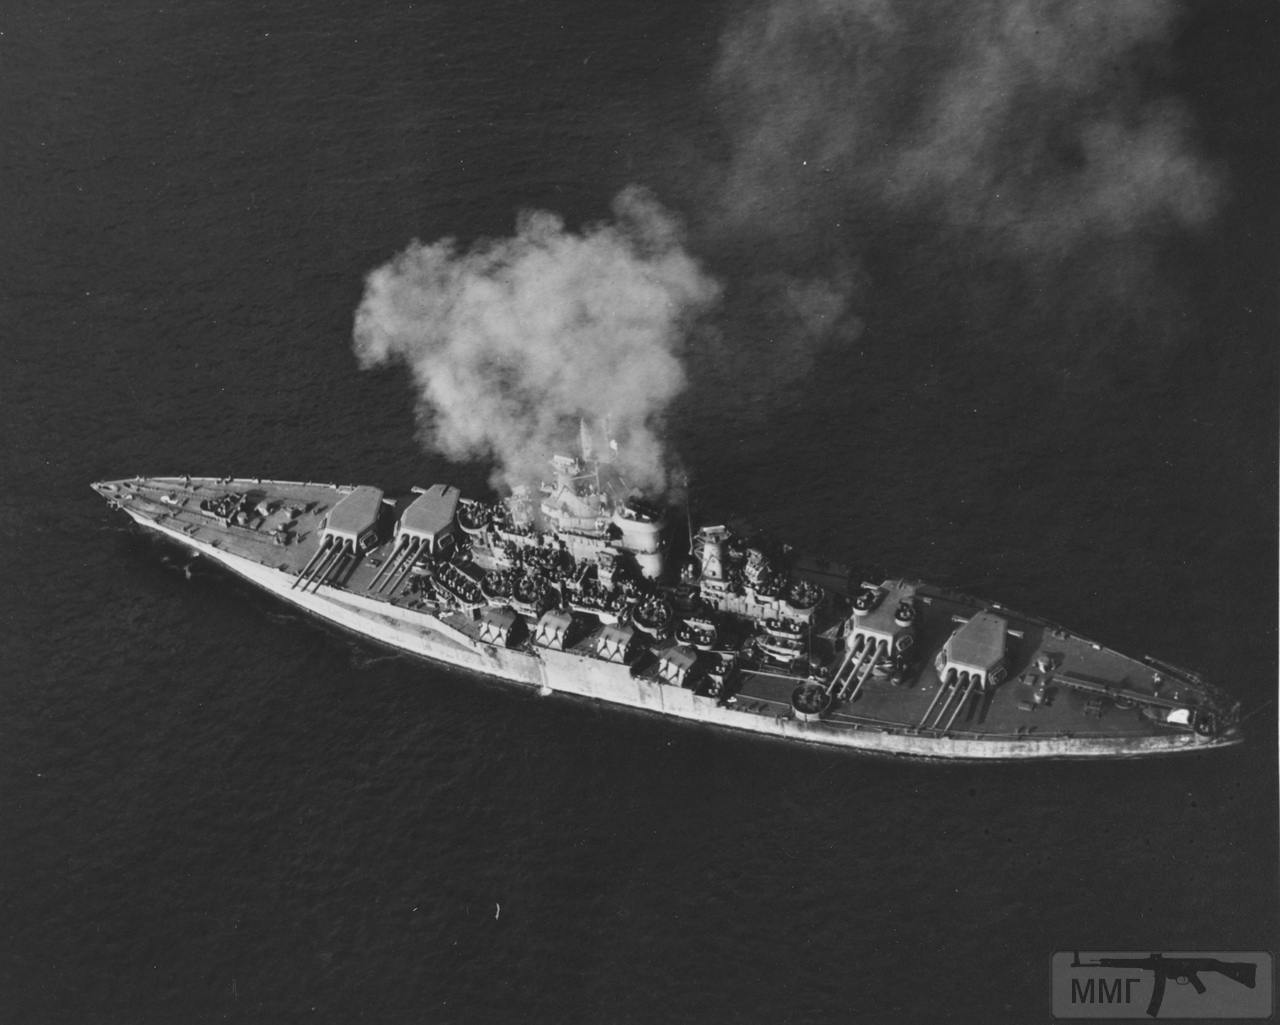 46370 - USS Tennessee (BB-43)